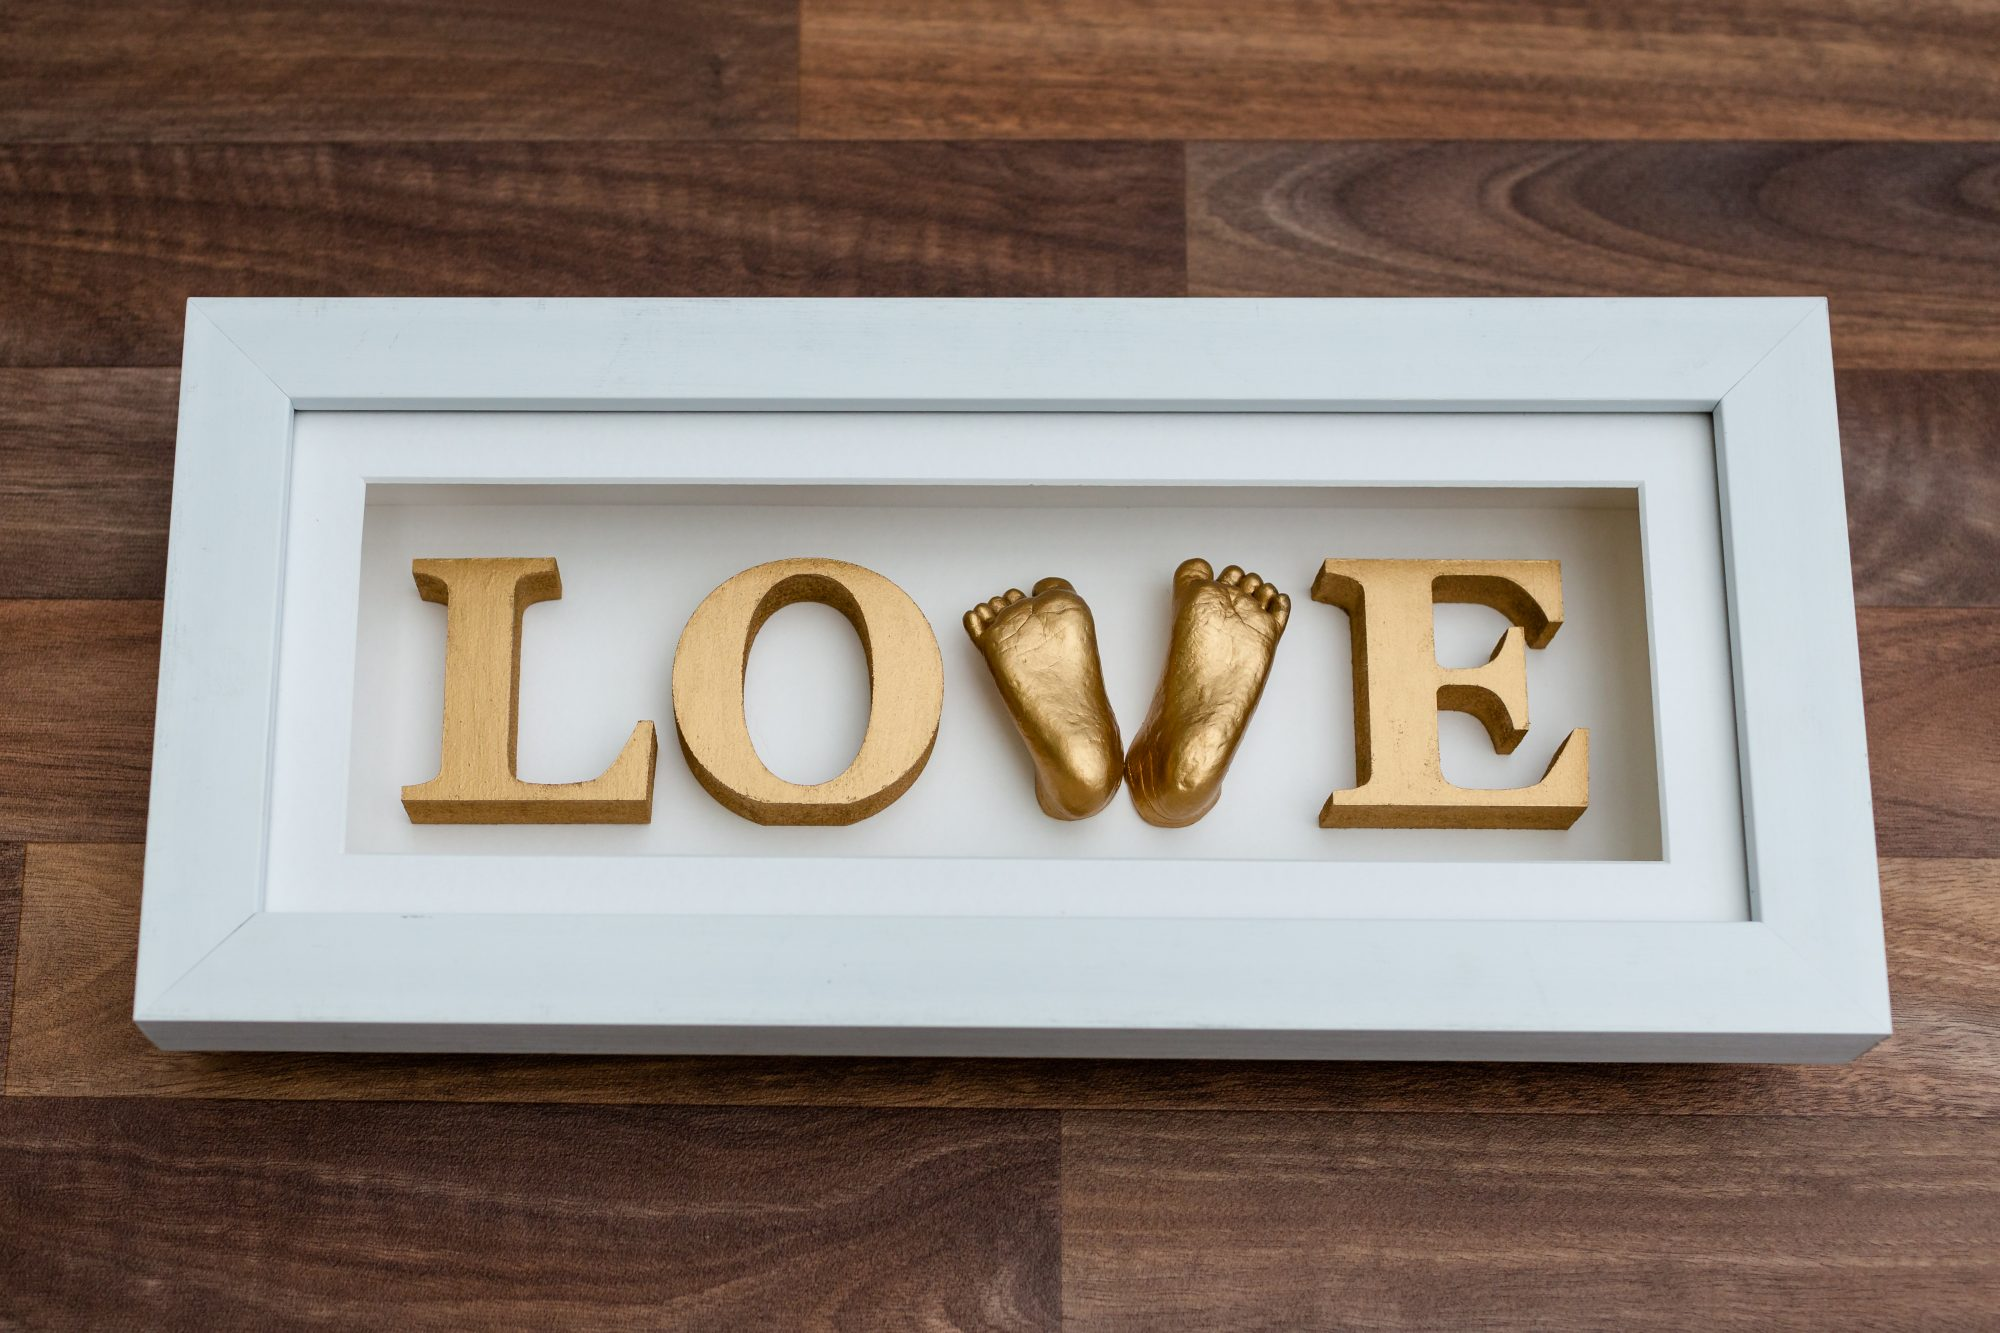 Casting Love LOVE frame